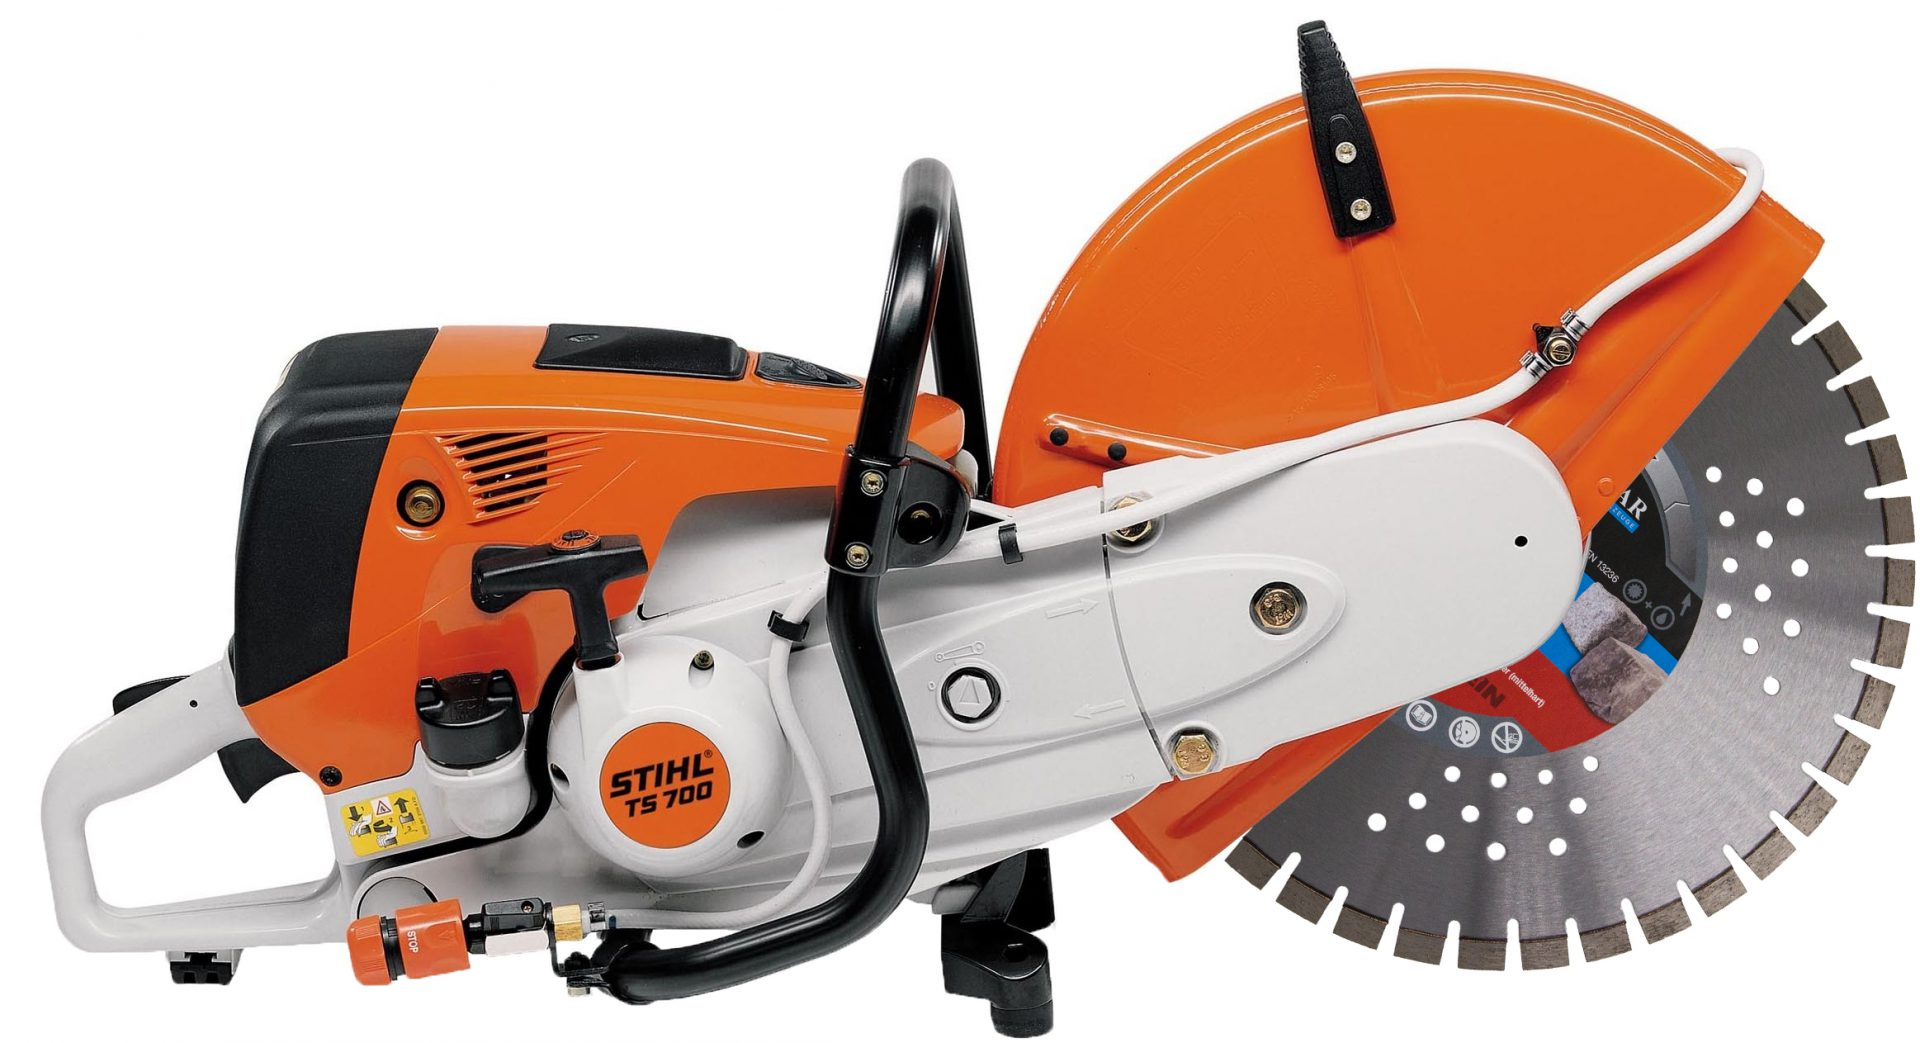 Stihl-ts-7800-motor-band-zaag-door-slijp-machine-nozar